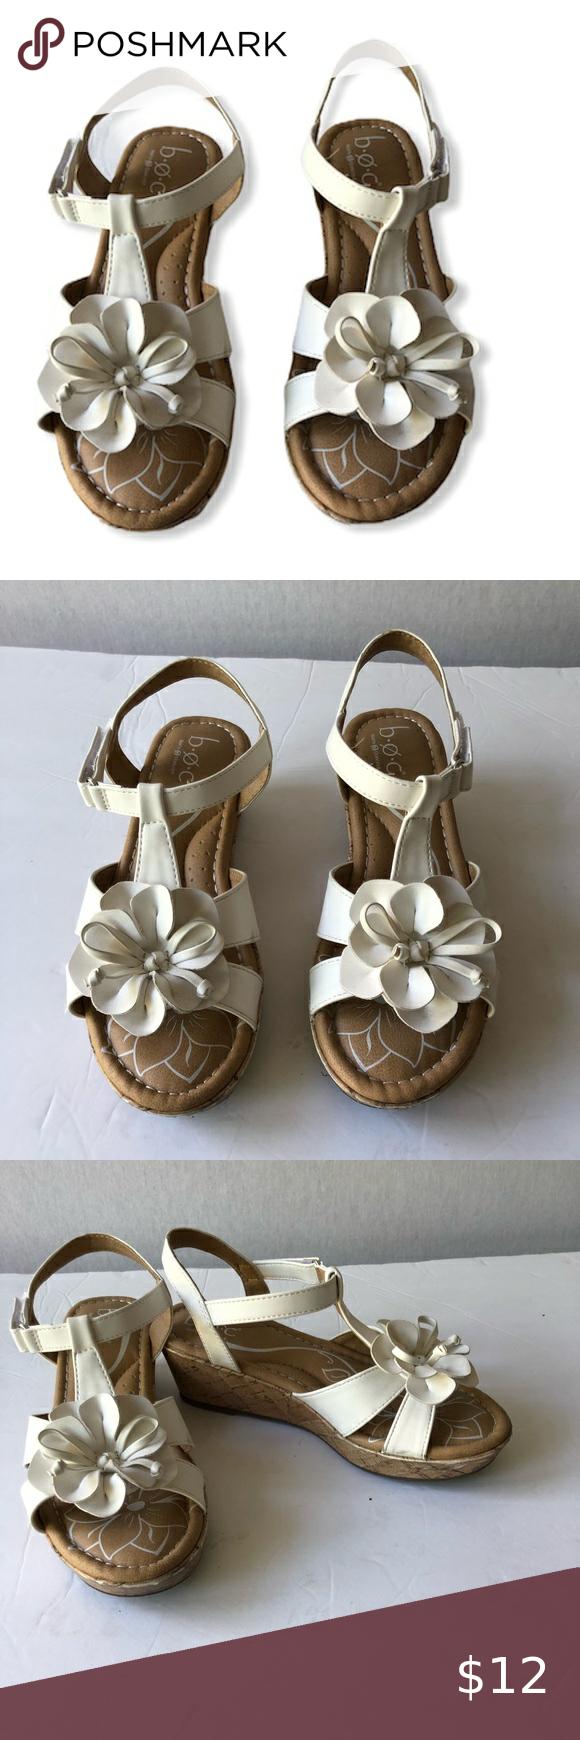 BOC Girls White Flower Sandals. Size 2